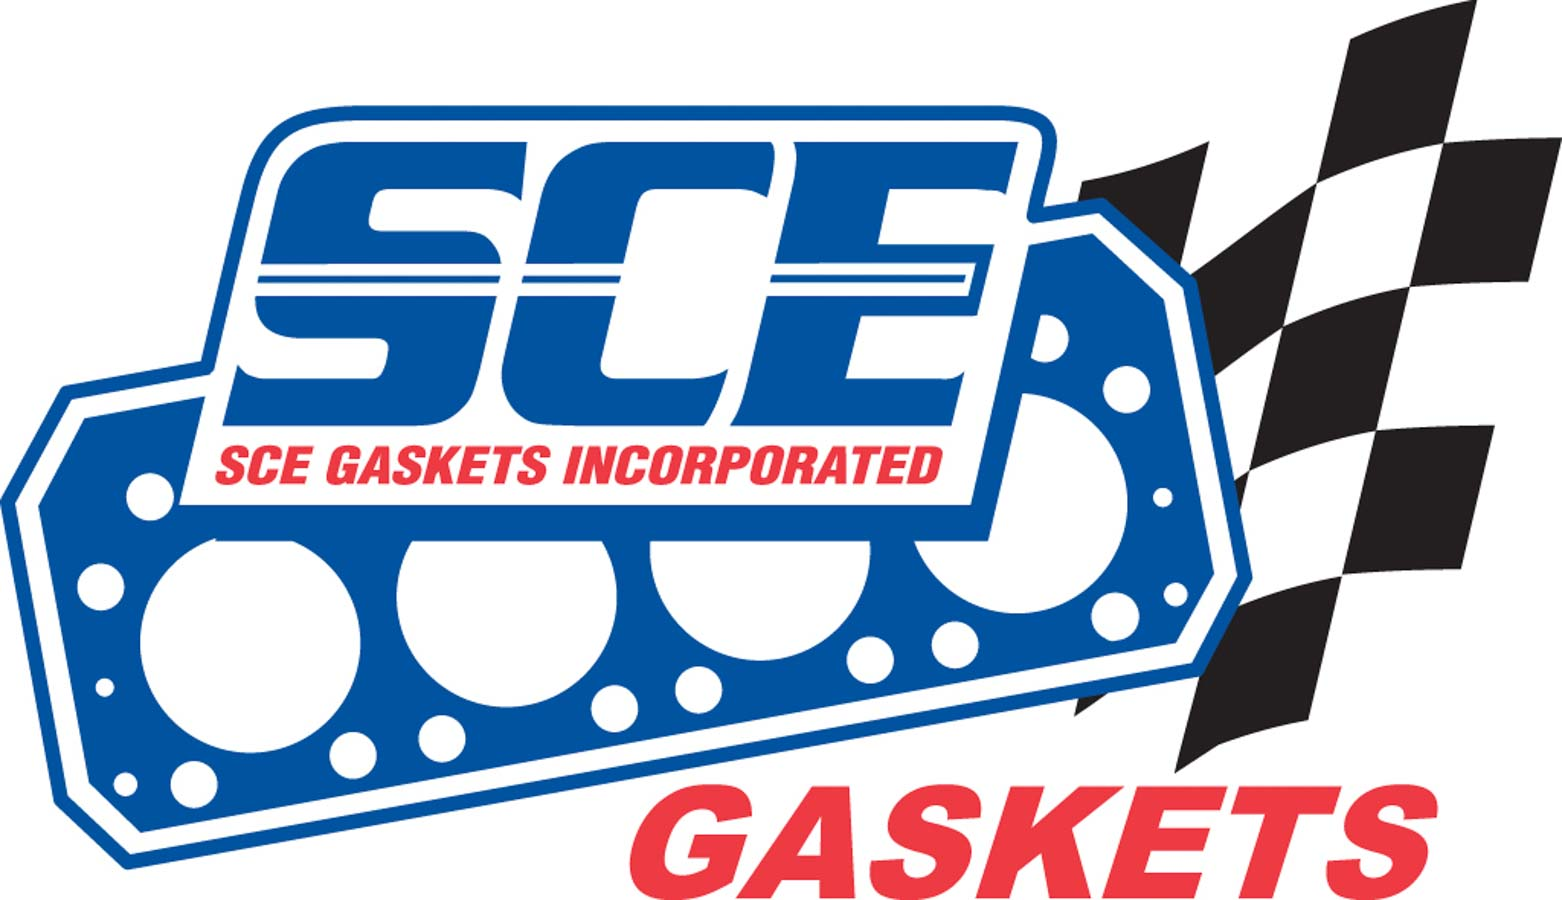 Parts & Accessories Automotive 10 SCE GASKETS 1108-10 SBC THERMOSTAT HOUSING GASKETS DYNO-PAK